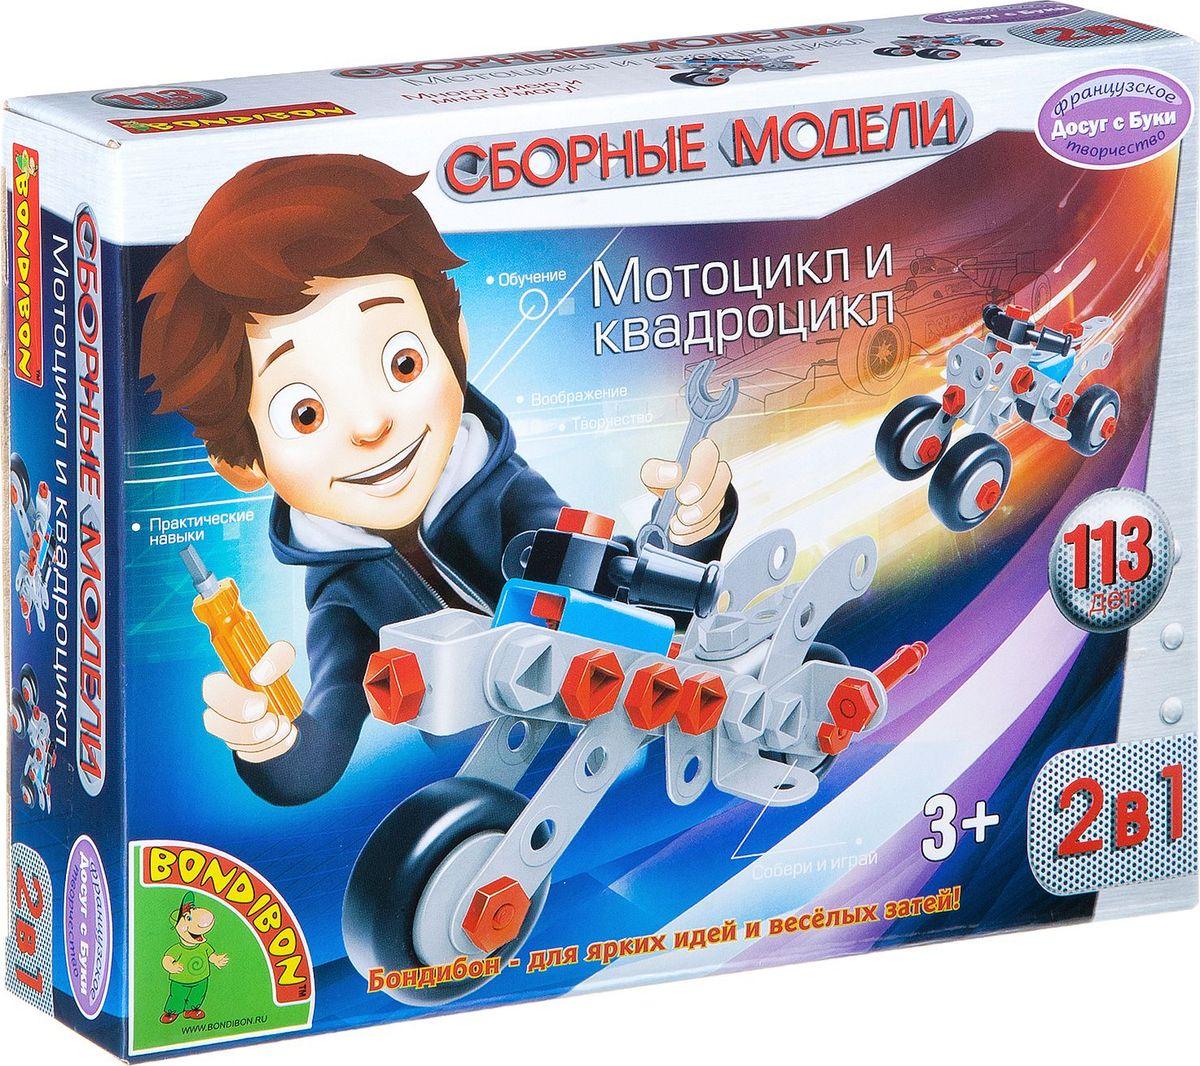 Bondibon Конструктор Мотоцикл и квадроцикл 2 в 1